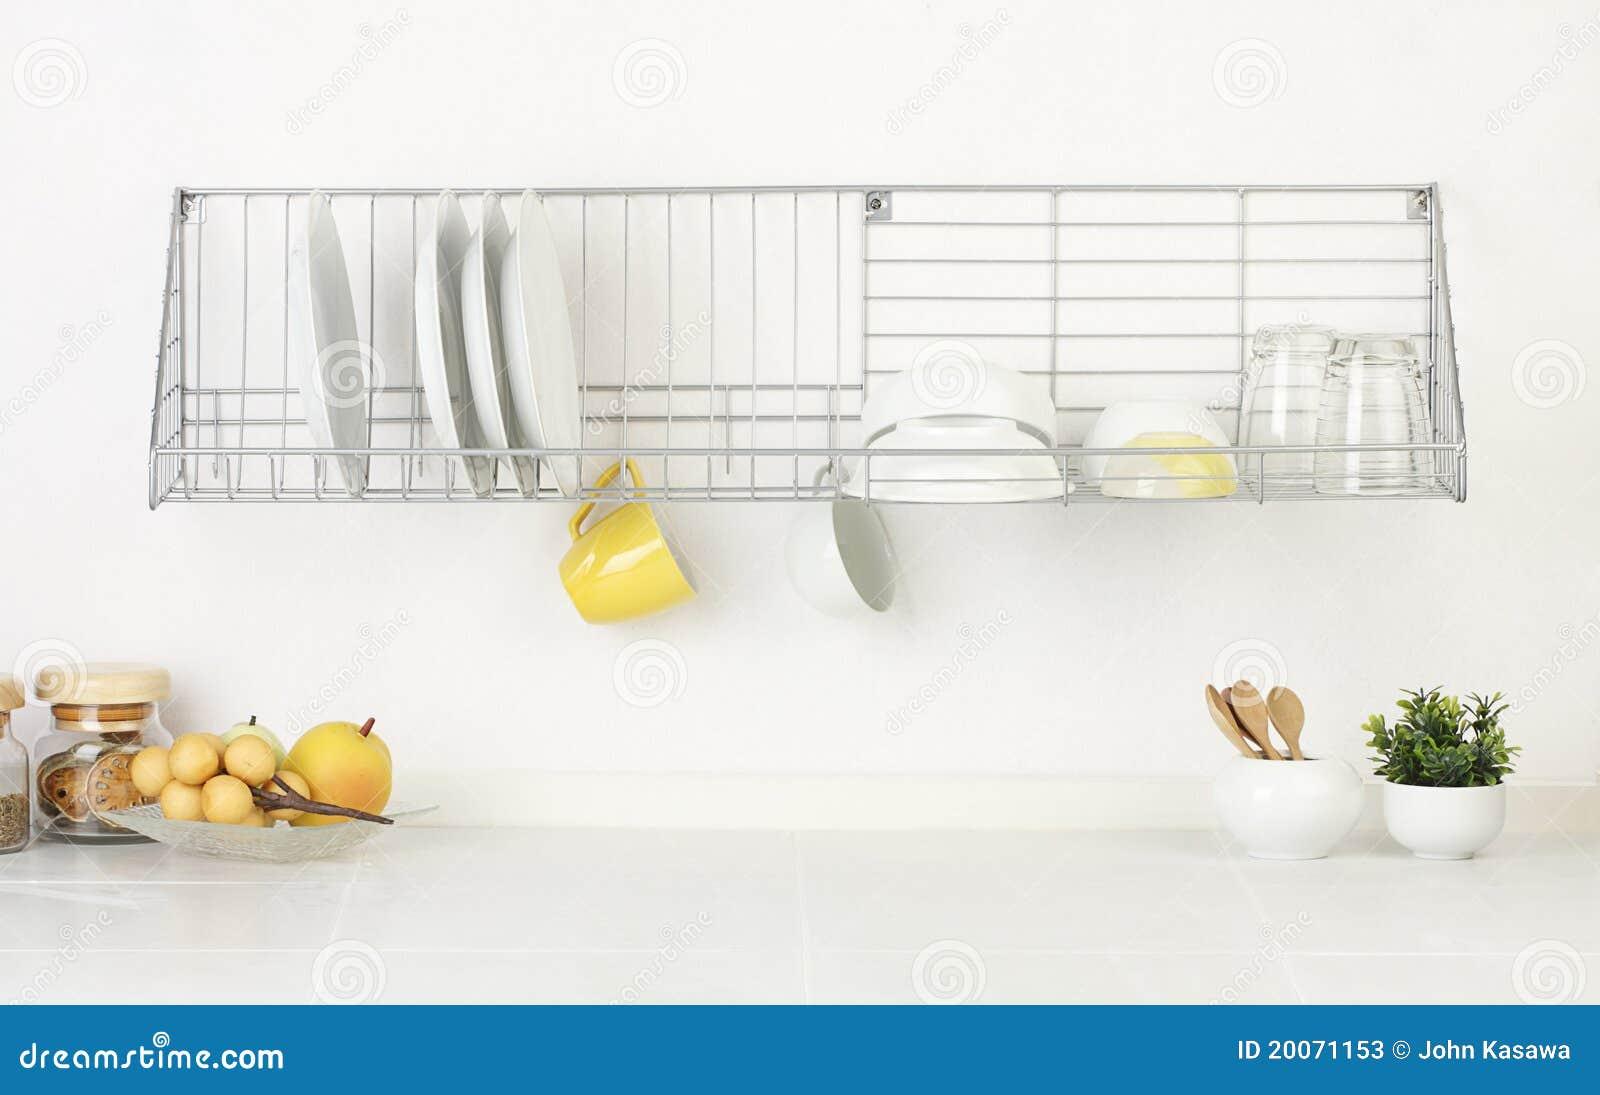 kitchen interior stock photos images pictures 101 985 images empty and blank space of kitchen interior stock photos